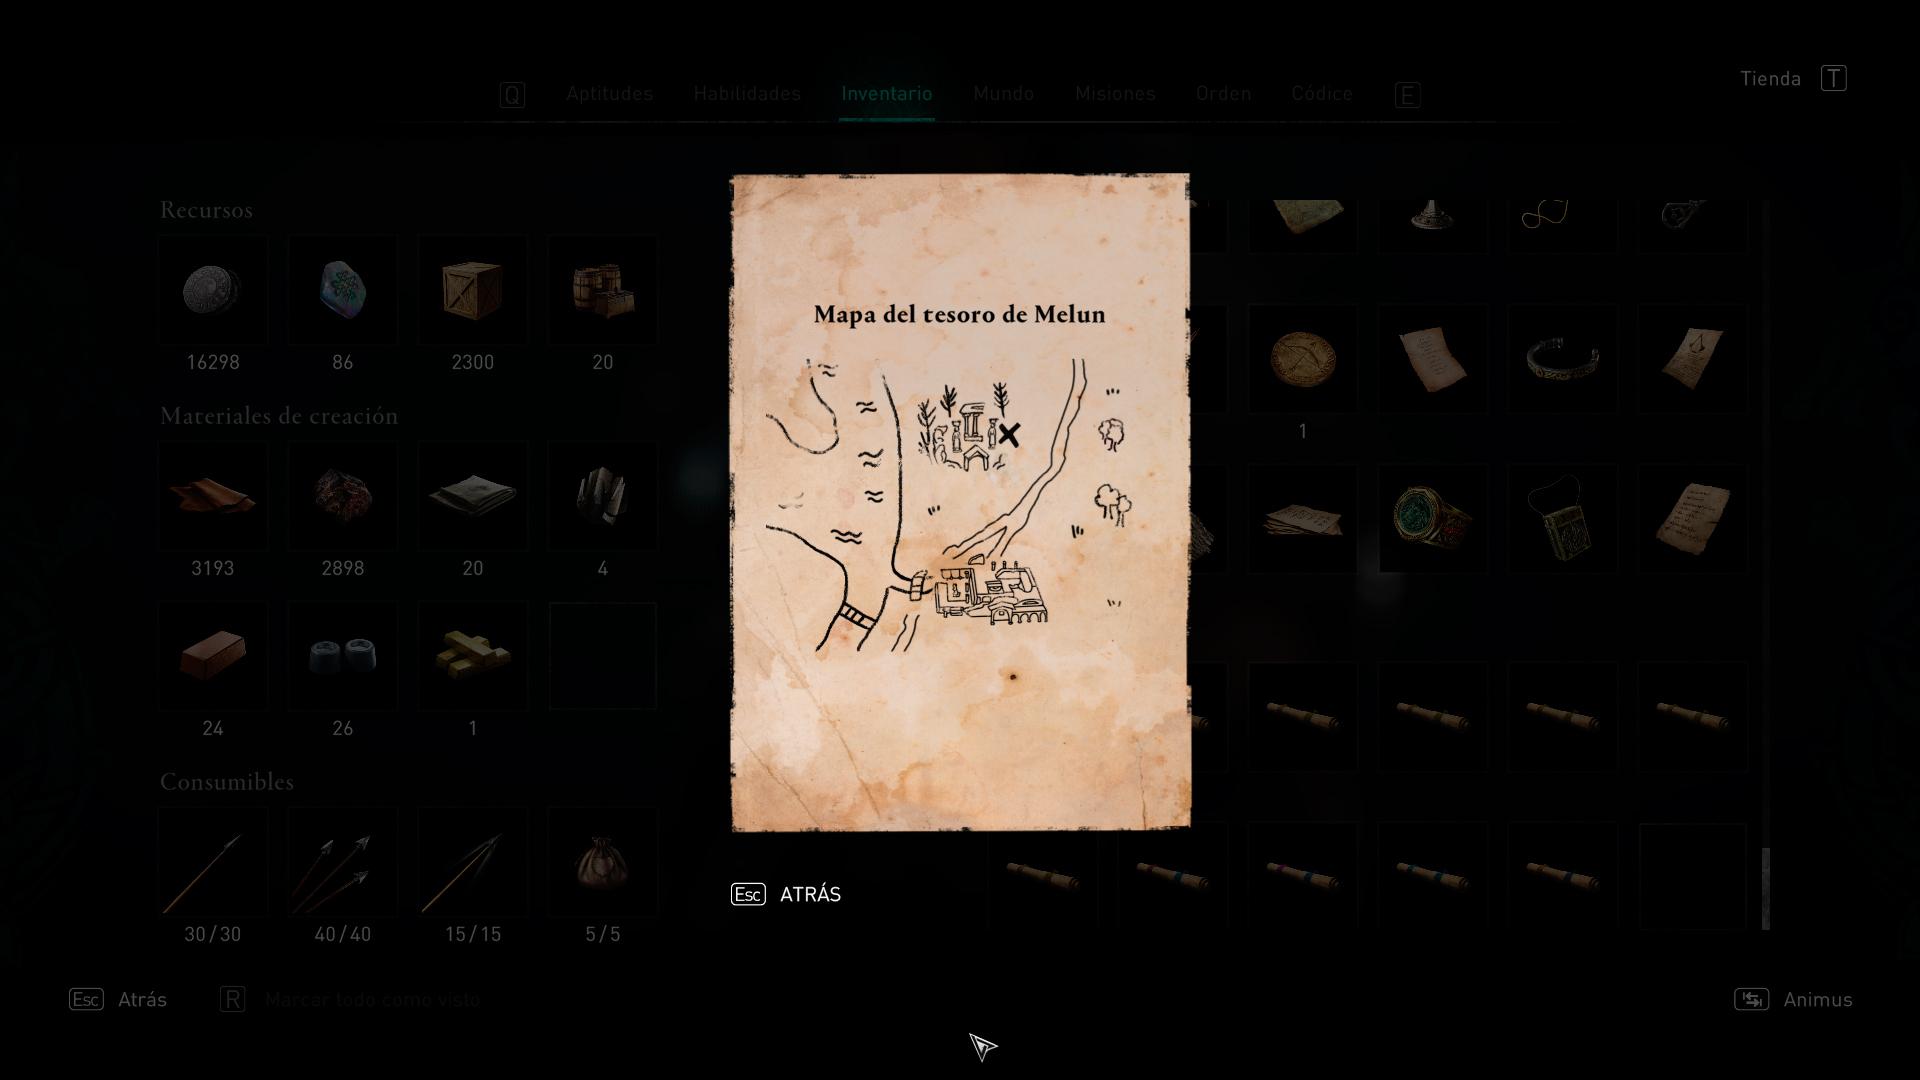 Mapa del tesoro de Melun en Assassin's Creed Valhalla